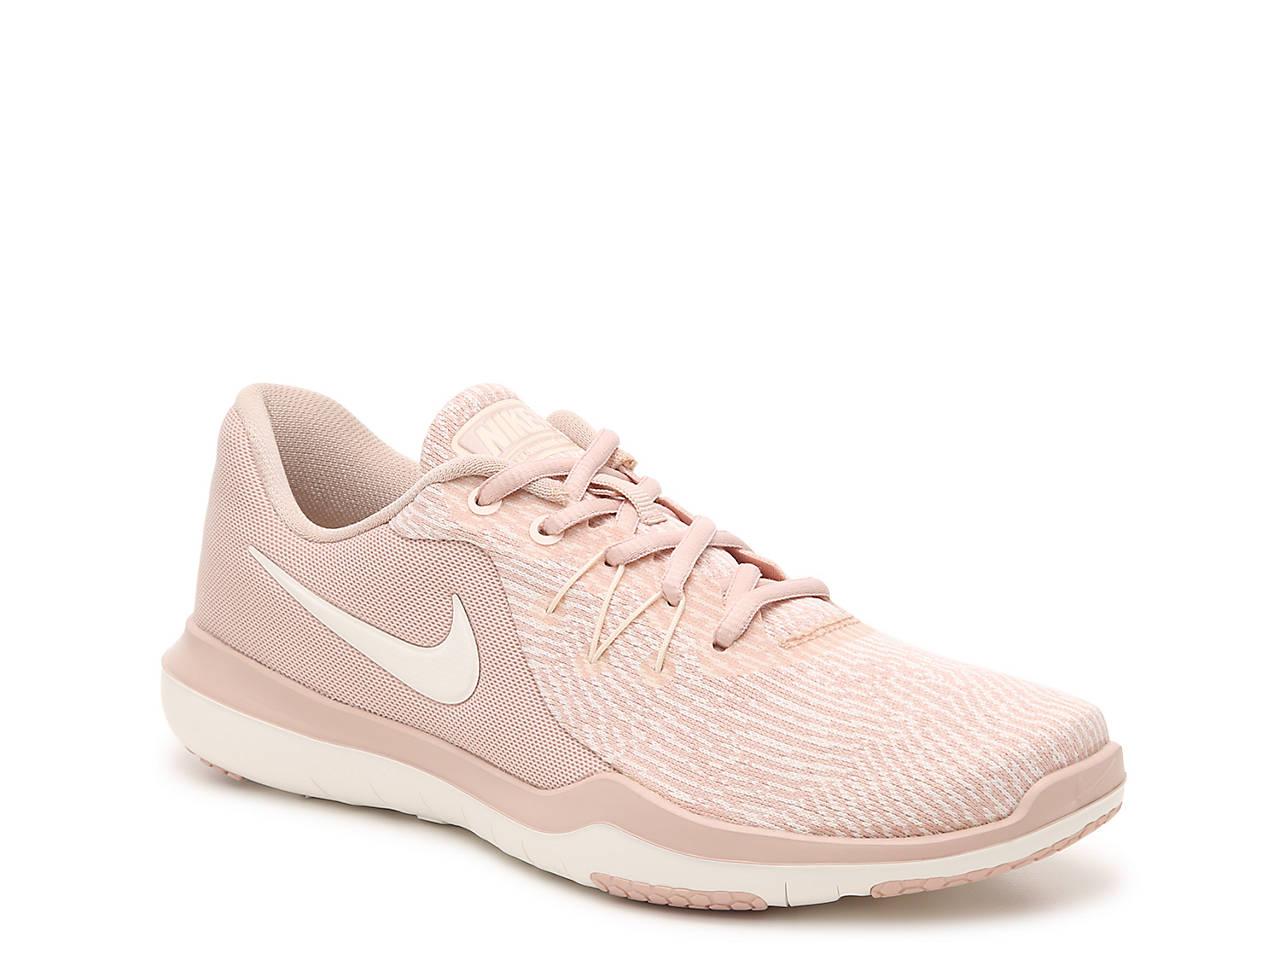 online store 66426 91518 Flex Supreme 6 Lightweight Training Shoe - Women's